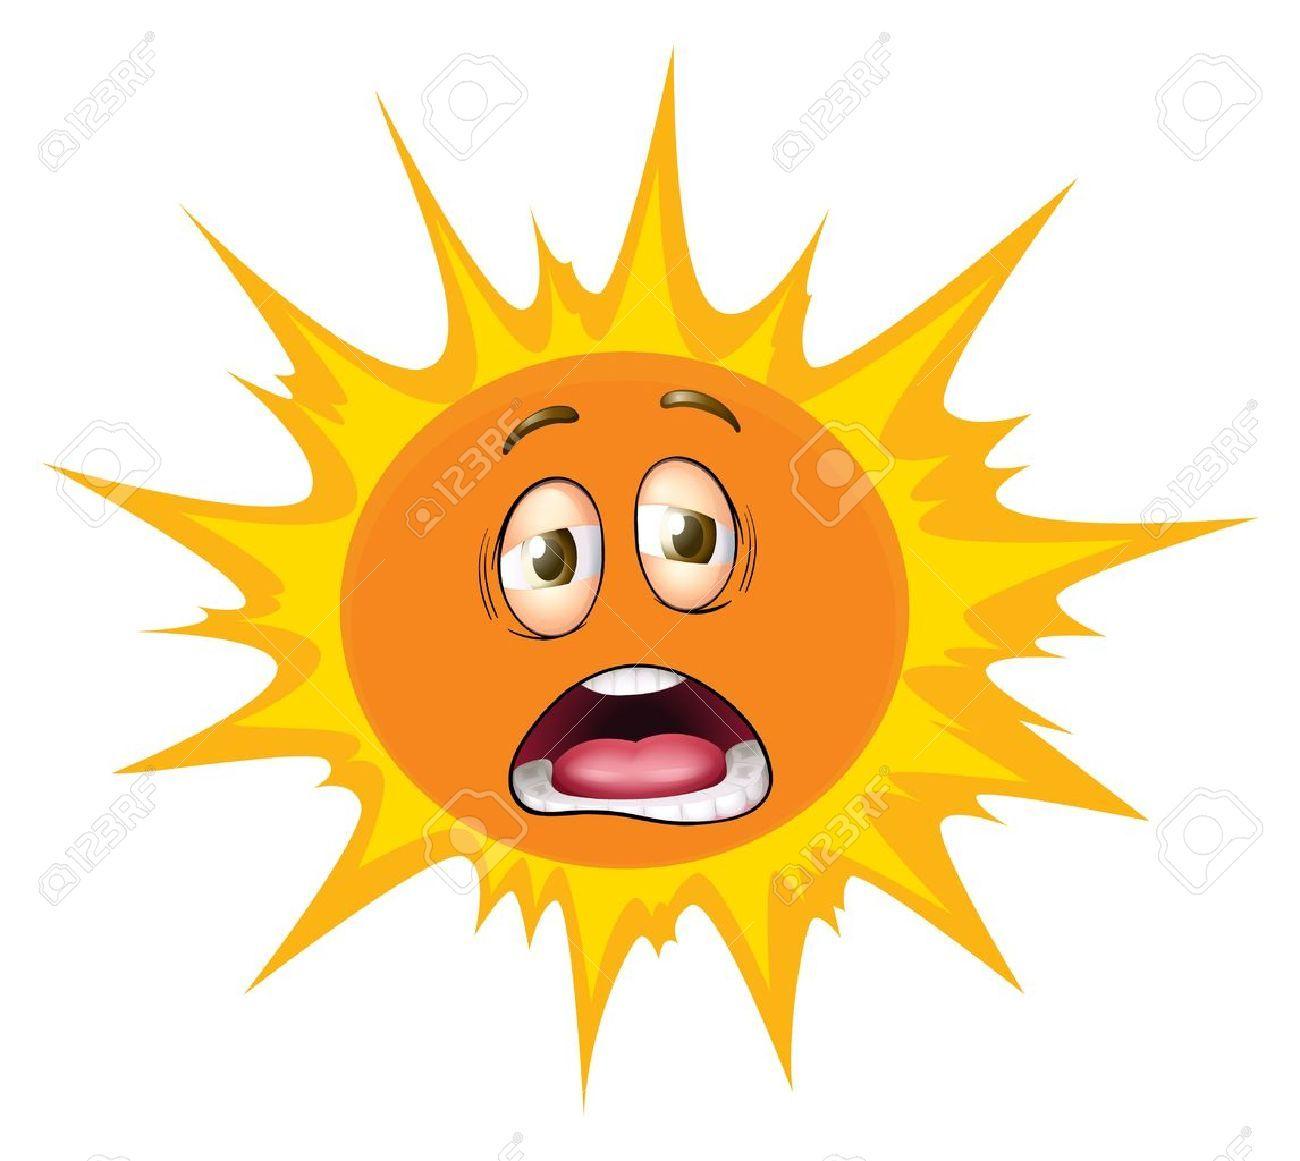 Hot sun clipart 2 » Clipart Portal.